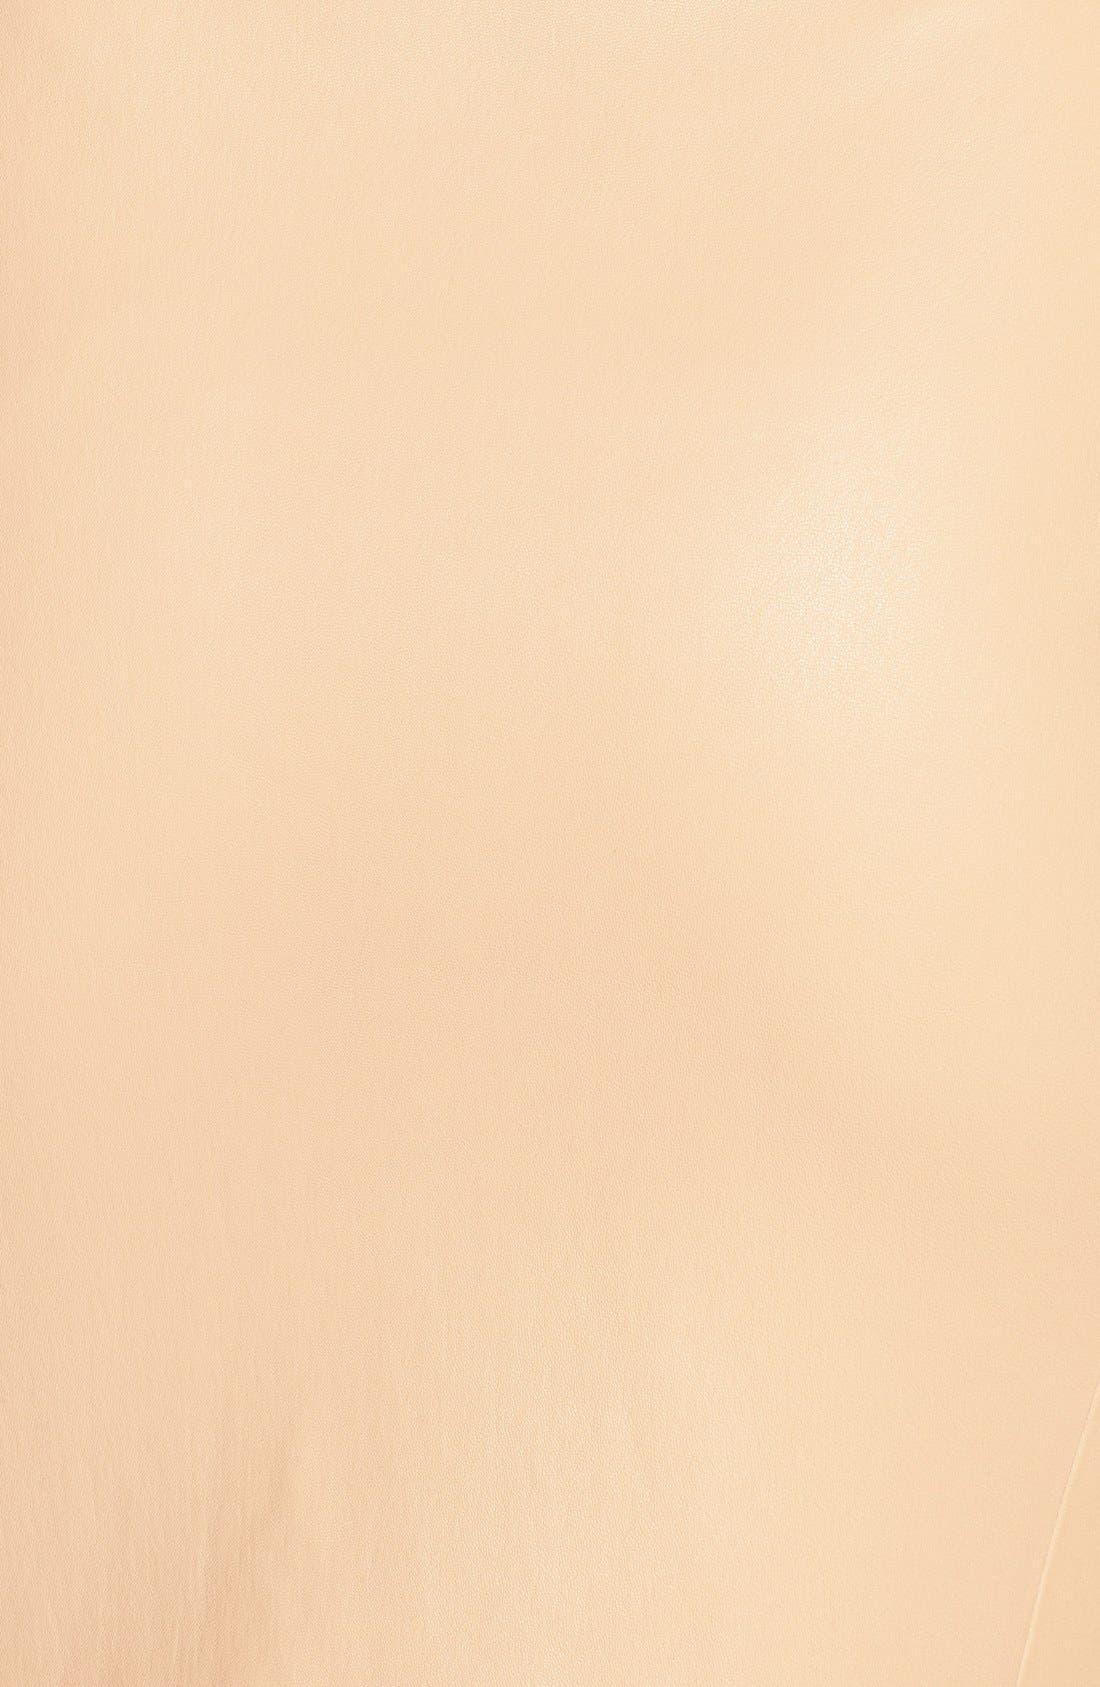 Alternate Image 3  - Diane von Furstenberg 'Marta' Paneled Leather Skirt